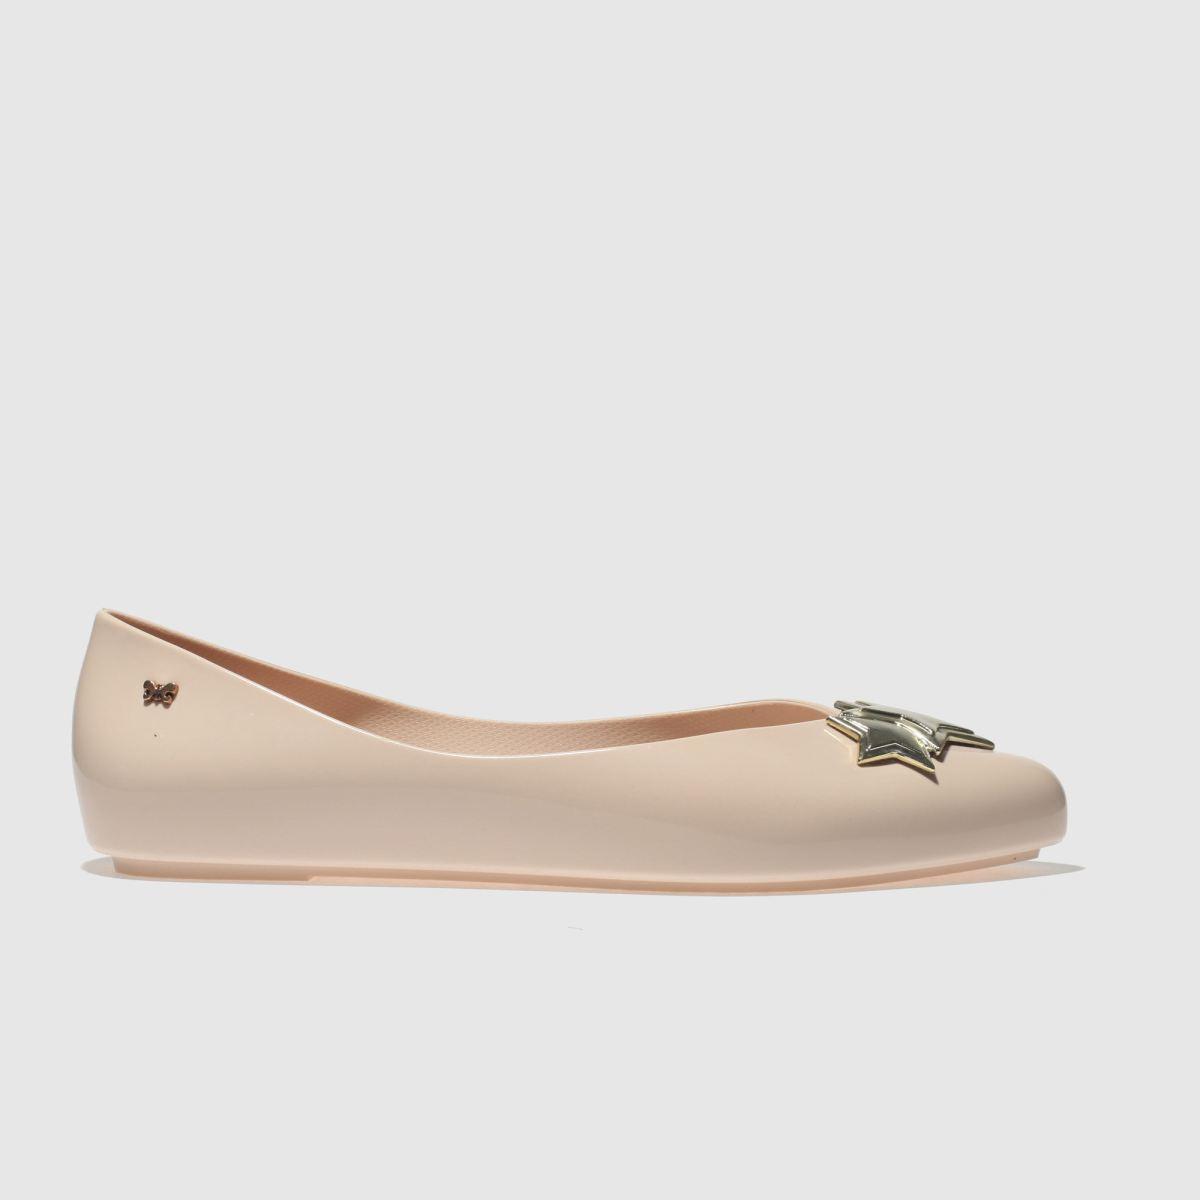 Zaxy Zaxy Natural Chic Flat Shoes